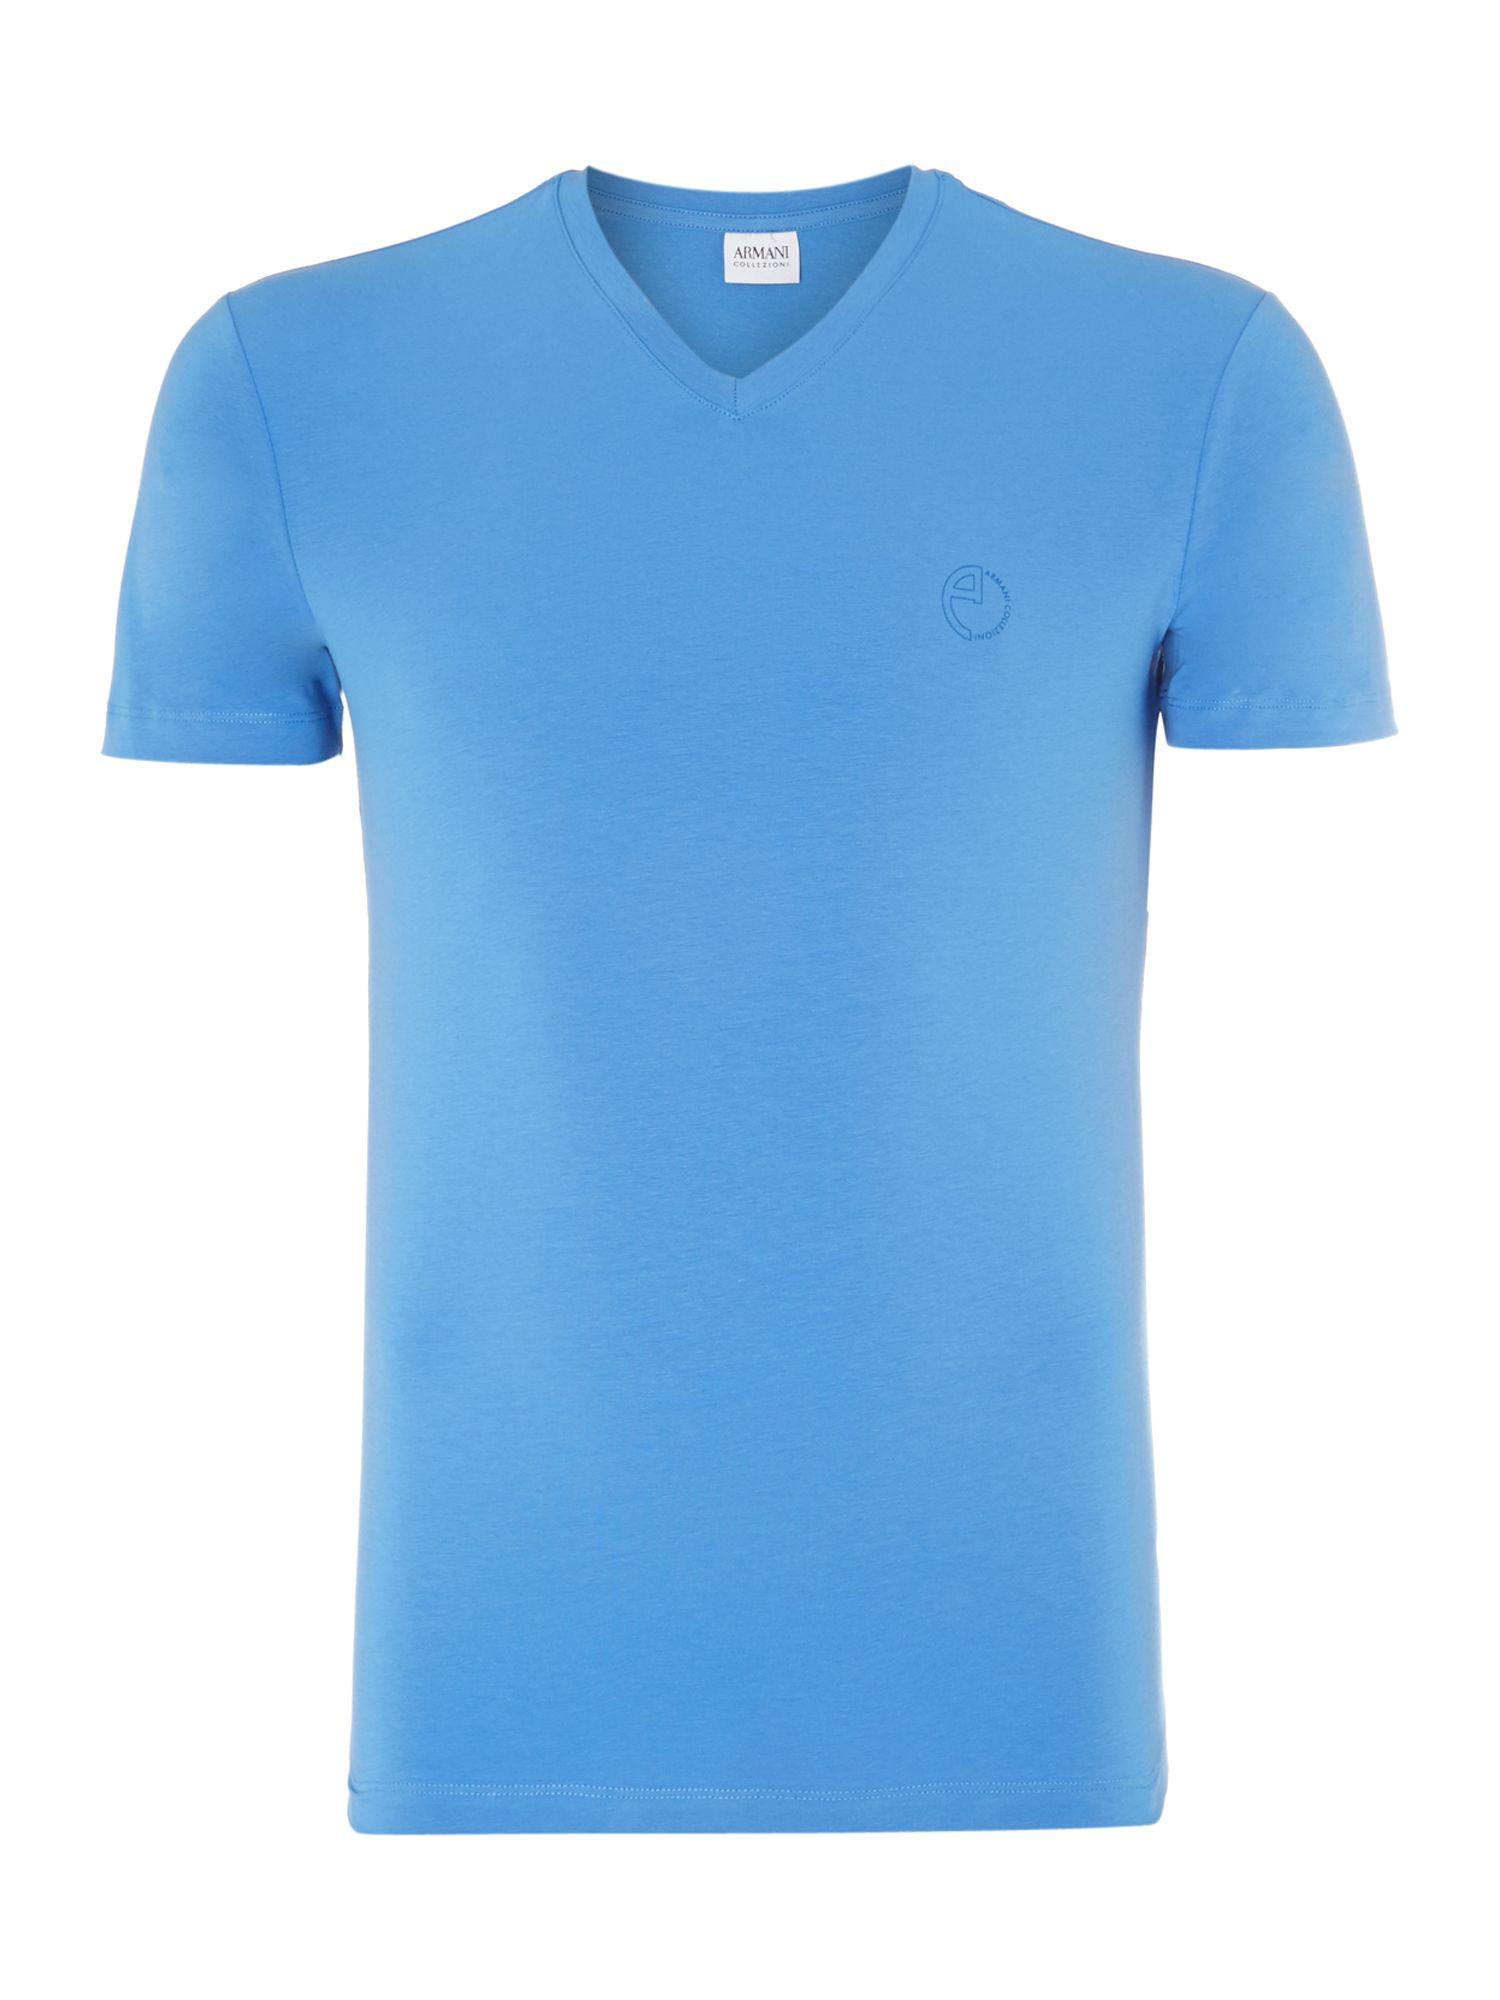 Armani vneck logo tshirt in blue for men lyst for Logo t shirt dress